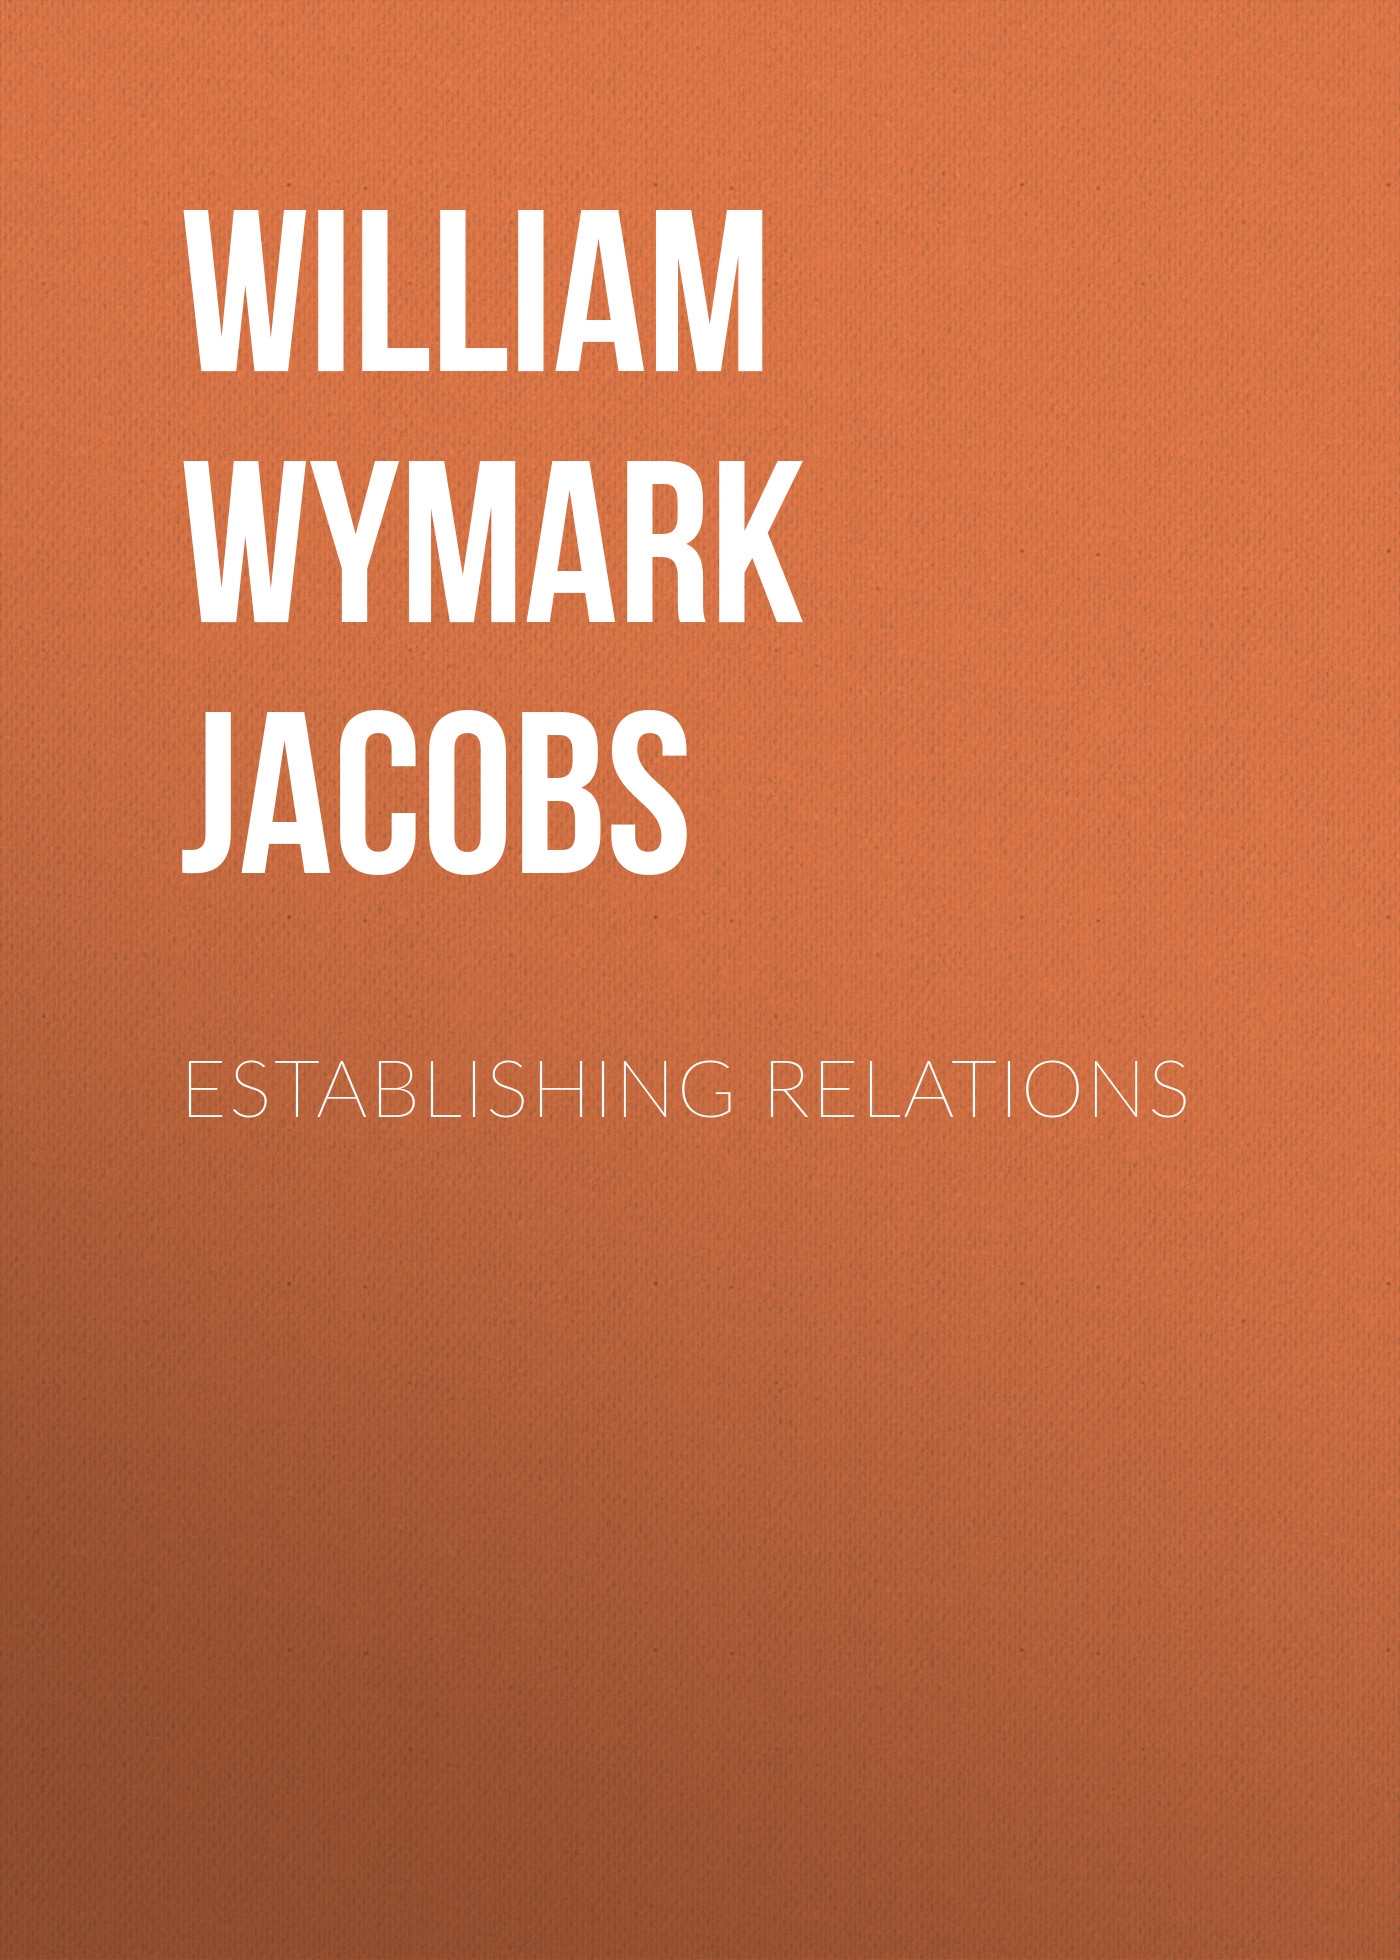 William Wymark Jacobs Establishing Relations